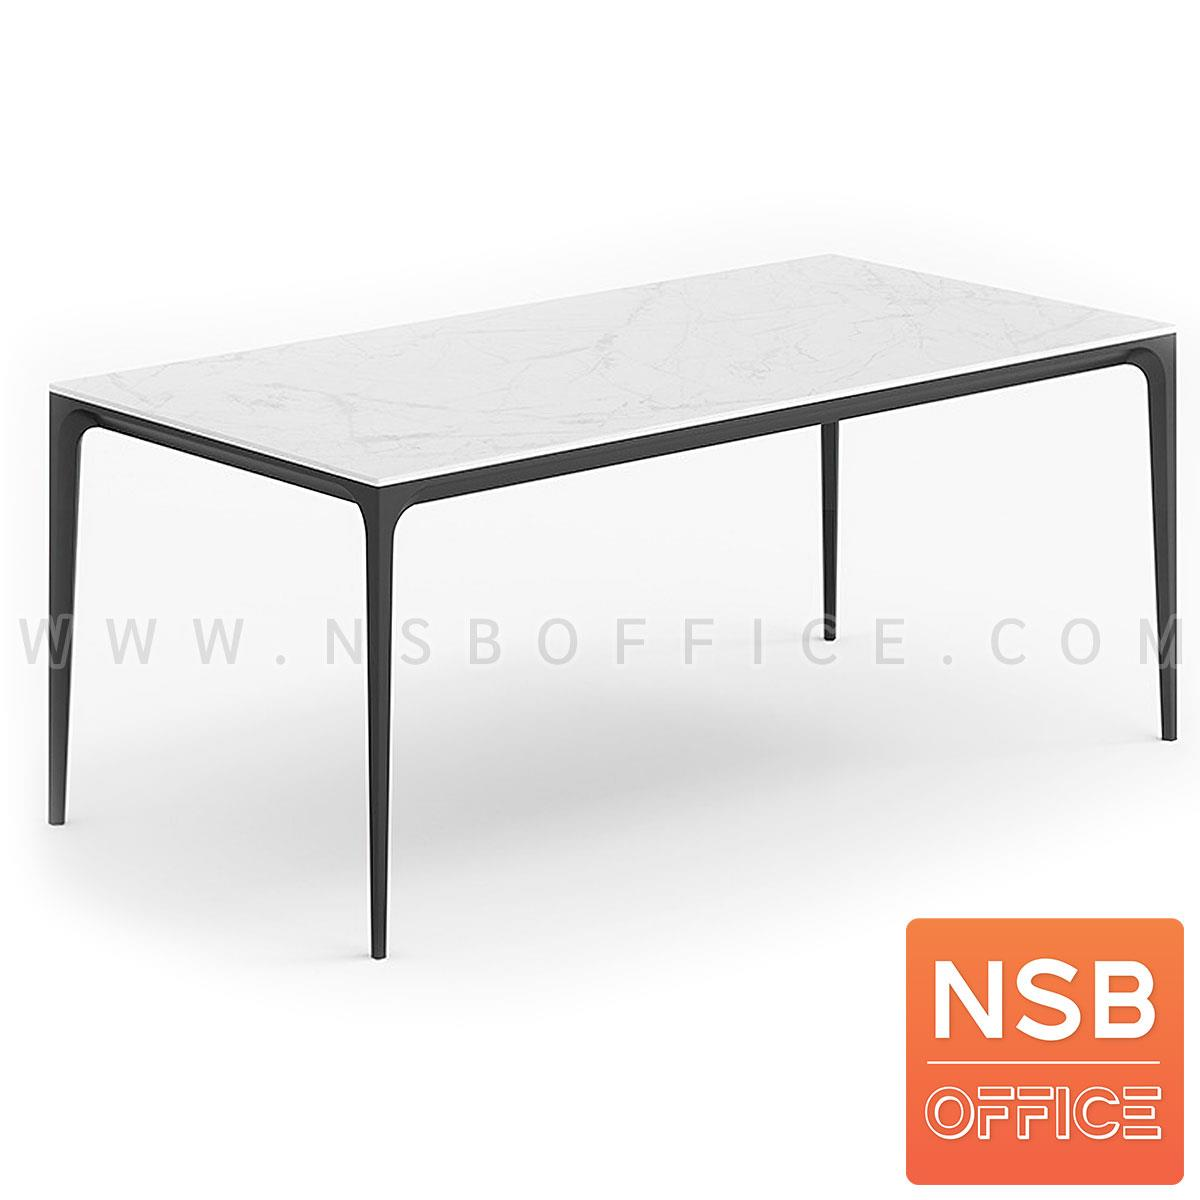 A05A233:โต๊ะทรงสี่เหลี่ยม รุ่น Flexcil (เฟล็กซิล) ขนาด 240W*120D cm. ขาเหล็กสีเทาเข้ม